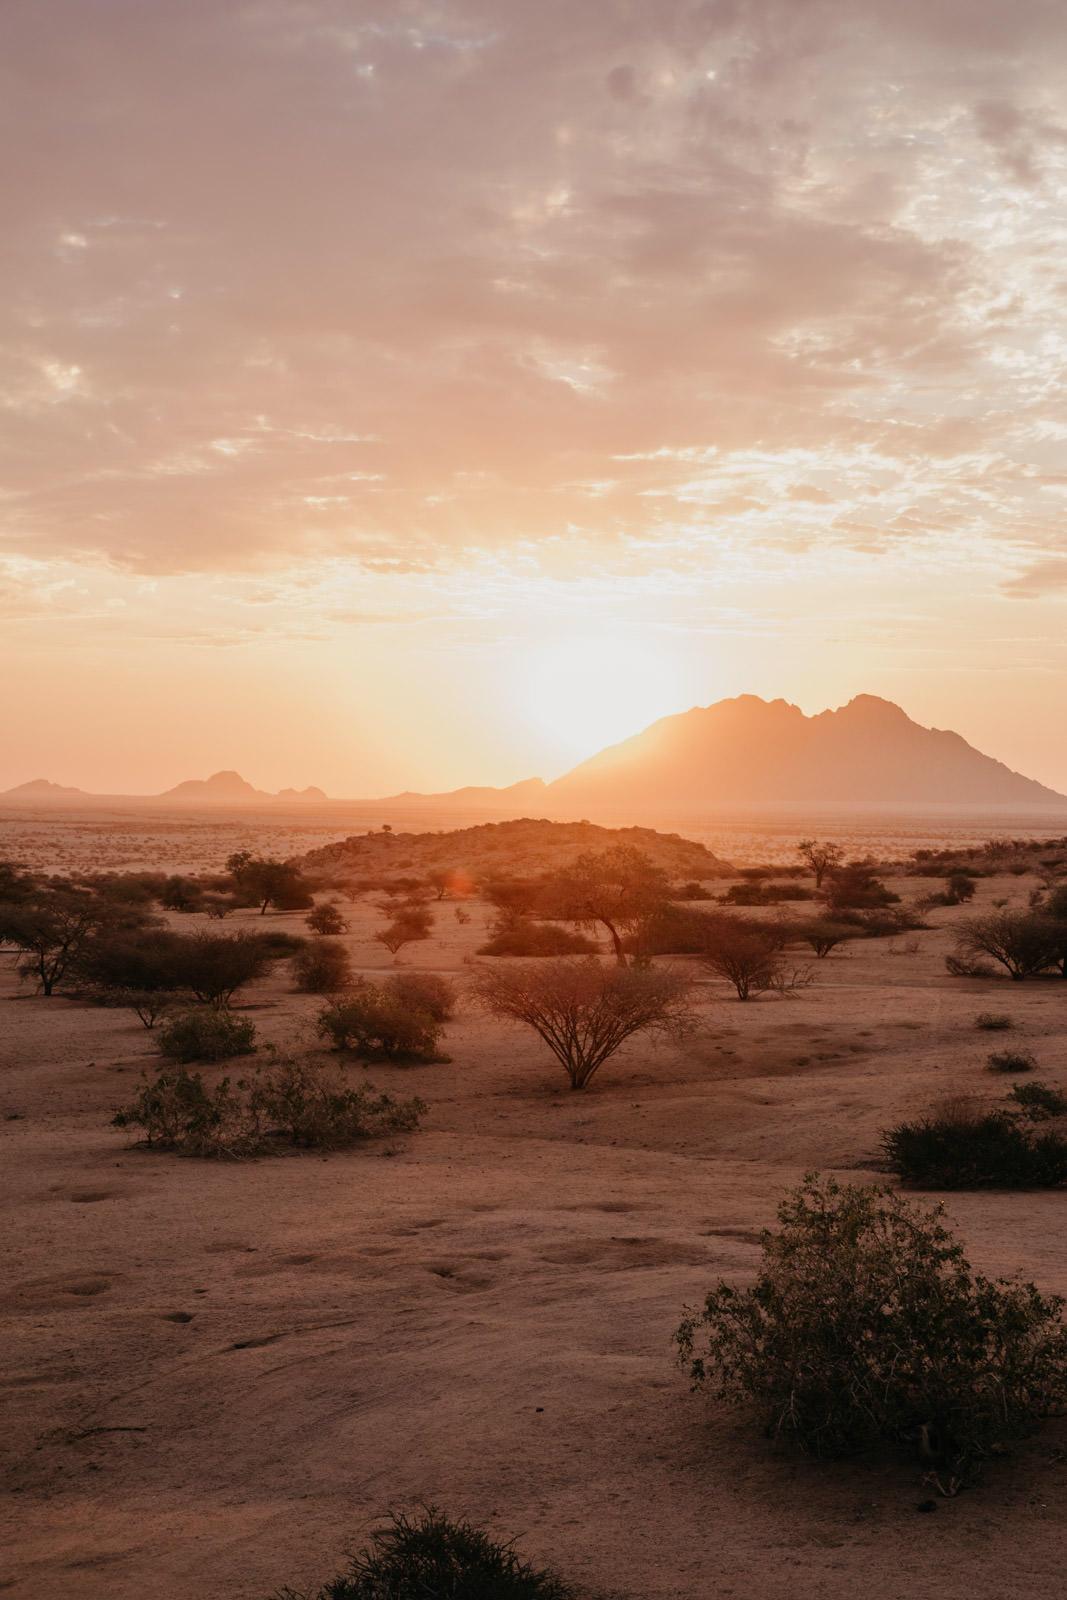 namibia_trip_rooftent_camping_roadtrip (14 von 18).jpg